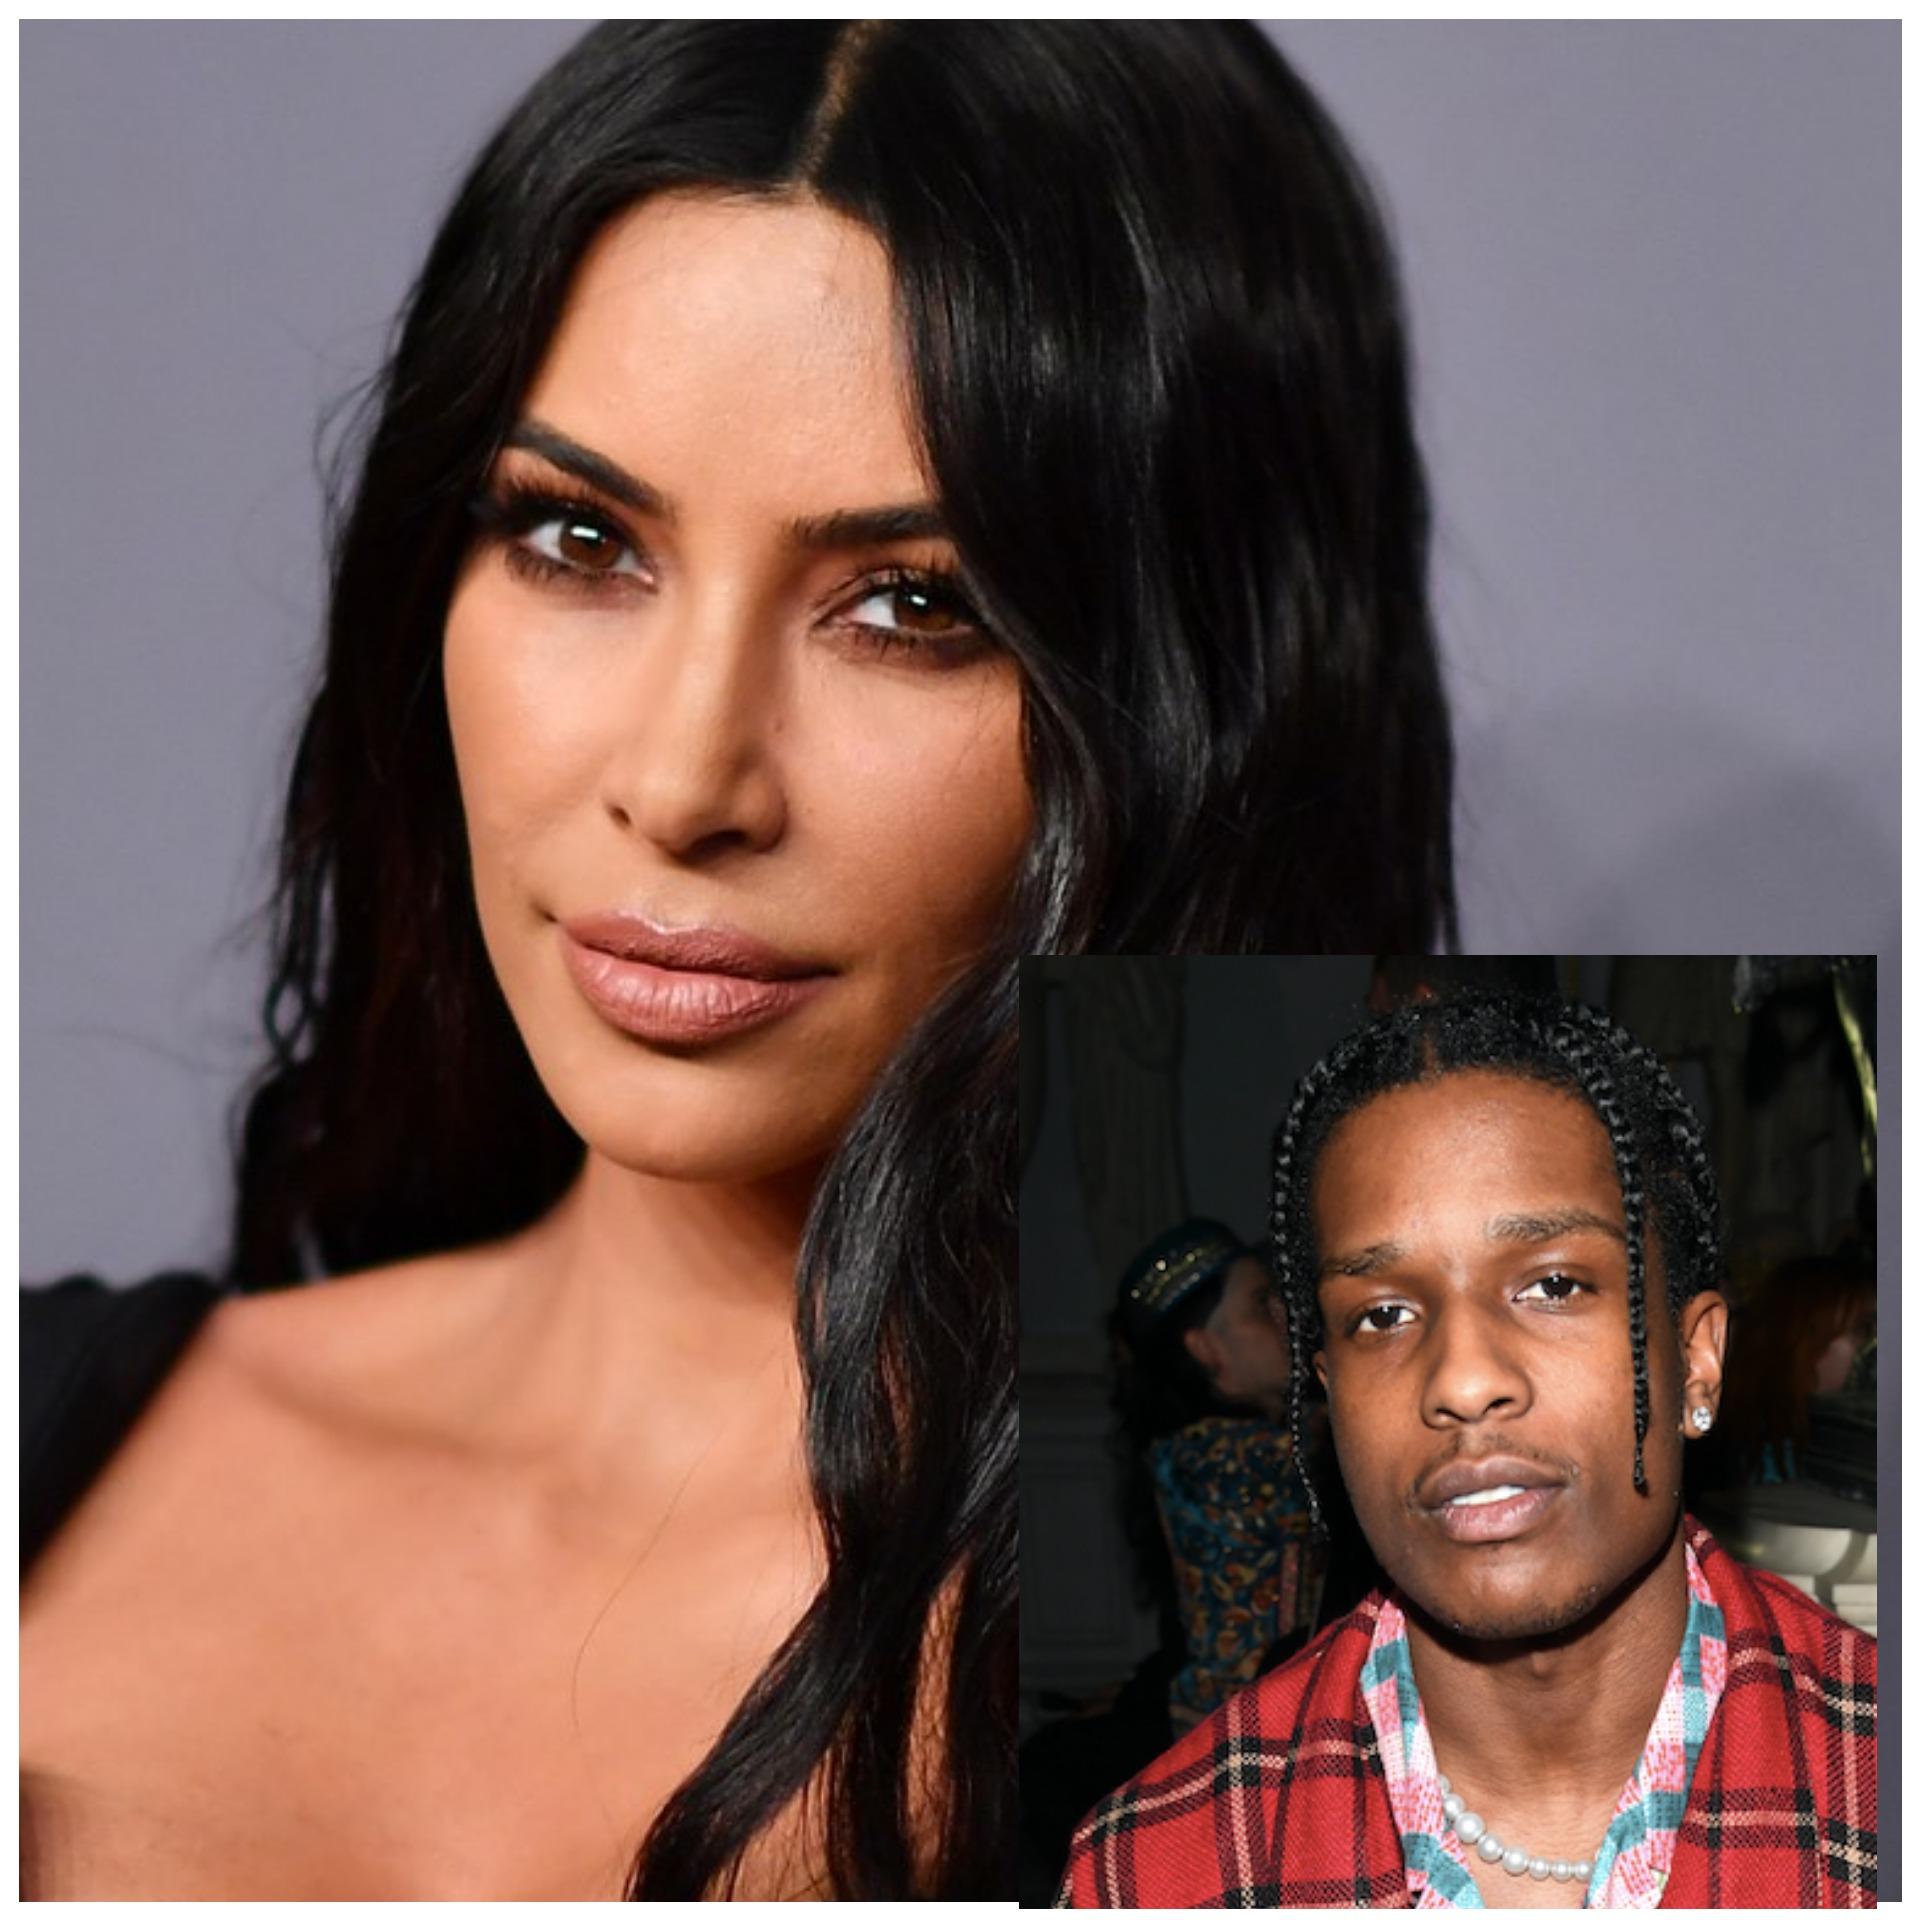 Kim Kardashian West Thanks Trump For Helping Free A$AP Rocky